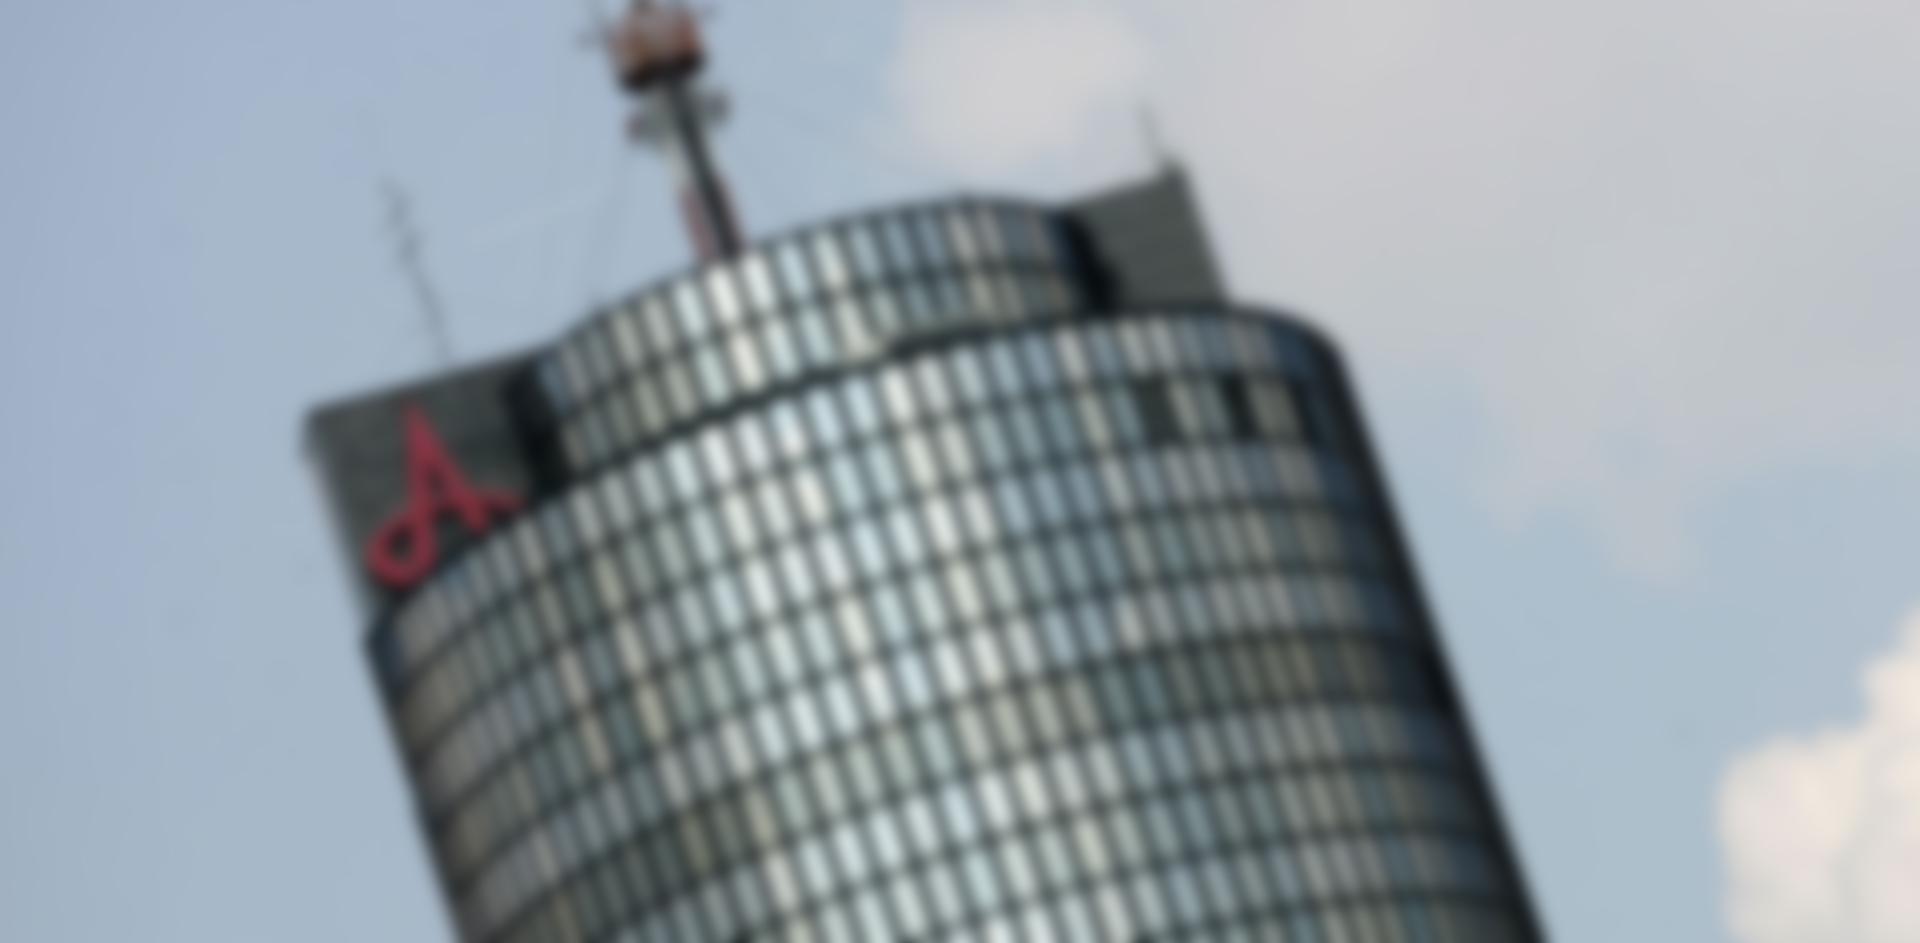 Tisak iskoristio 30,1 milijun eura iz roll-up kredita Agrokoru